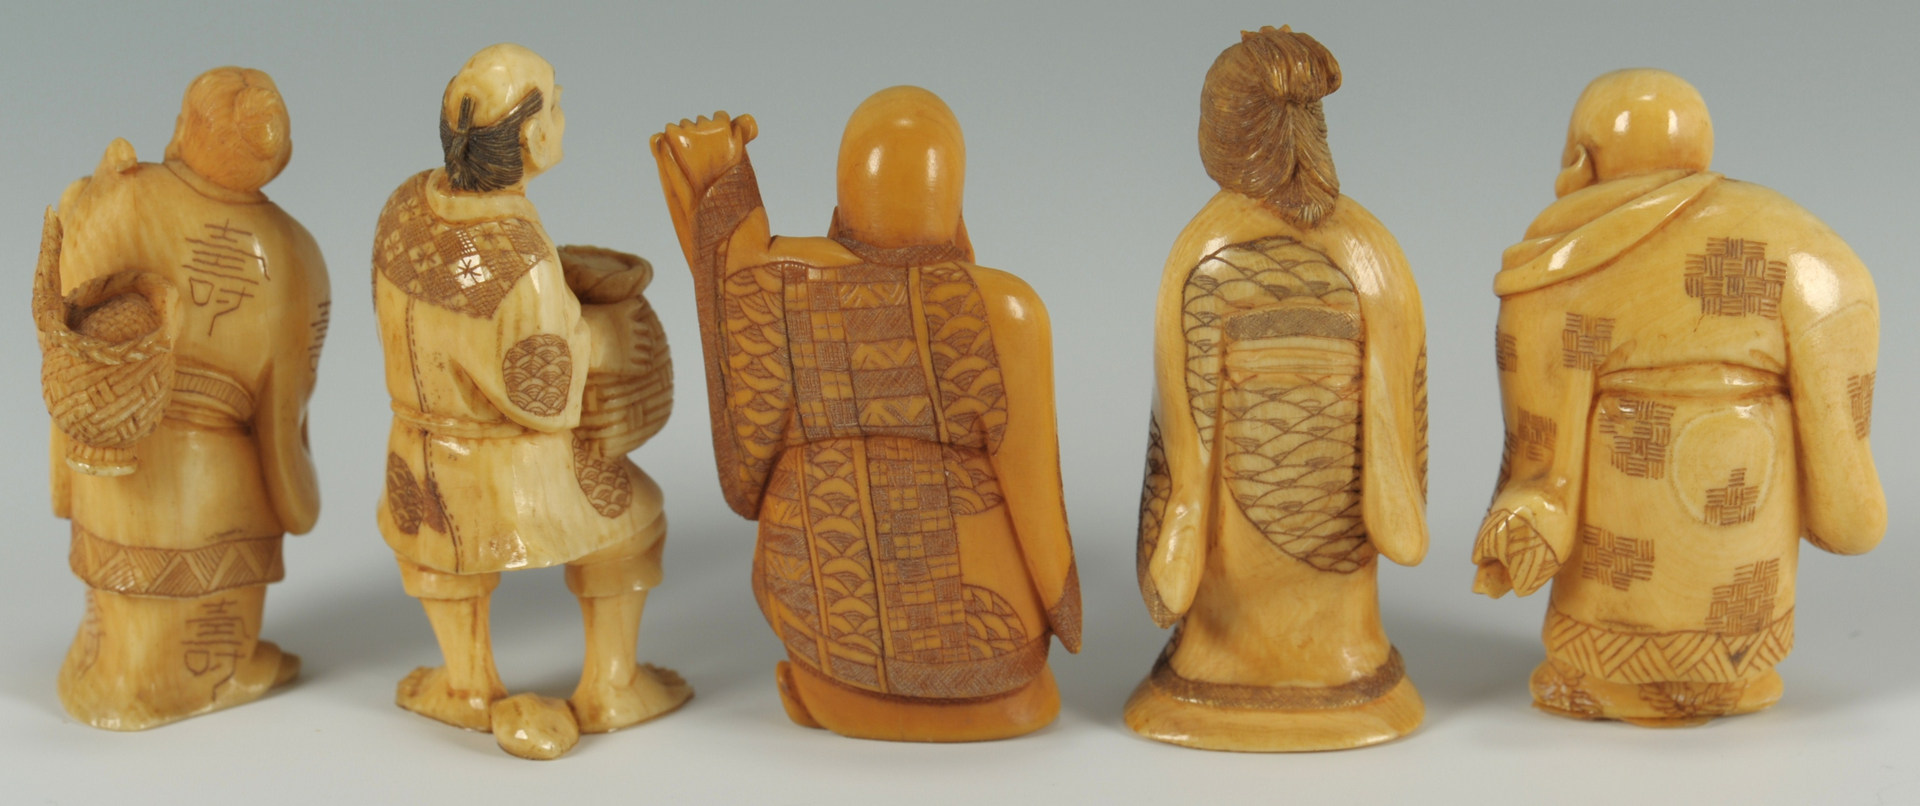 Lot 194: Five signed Japanese Carved Ivory Figures